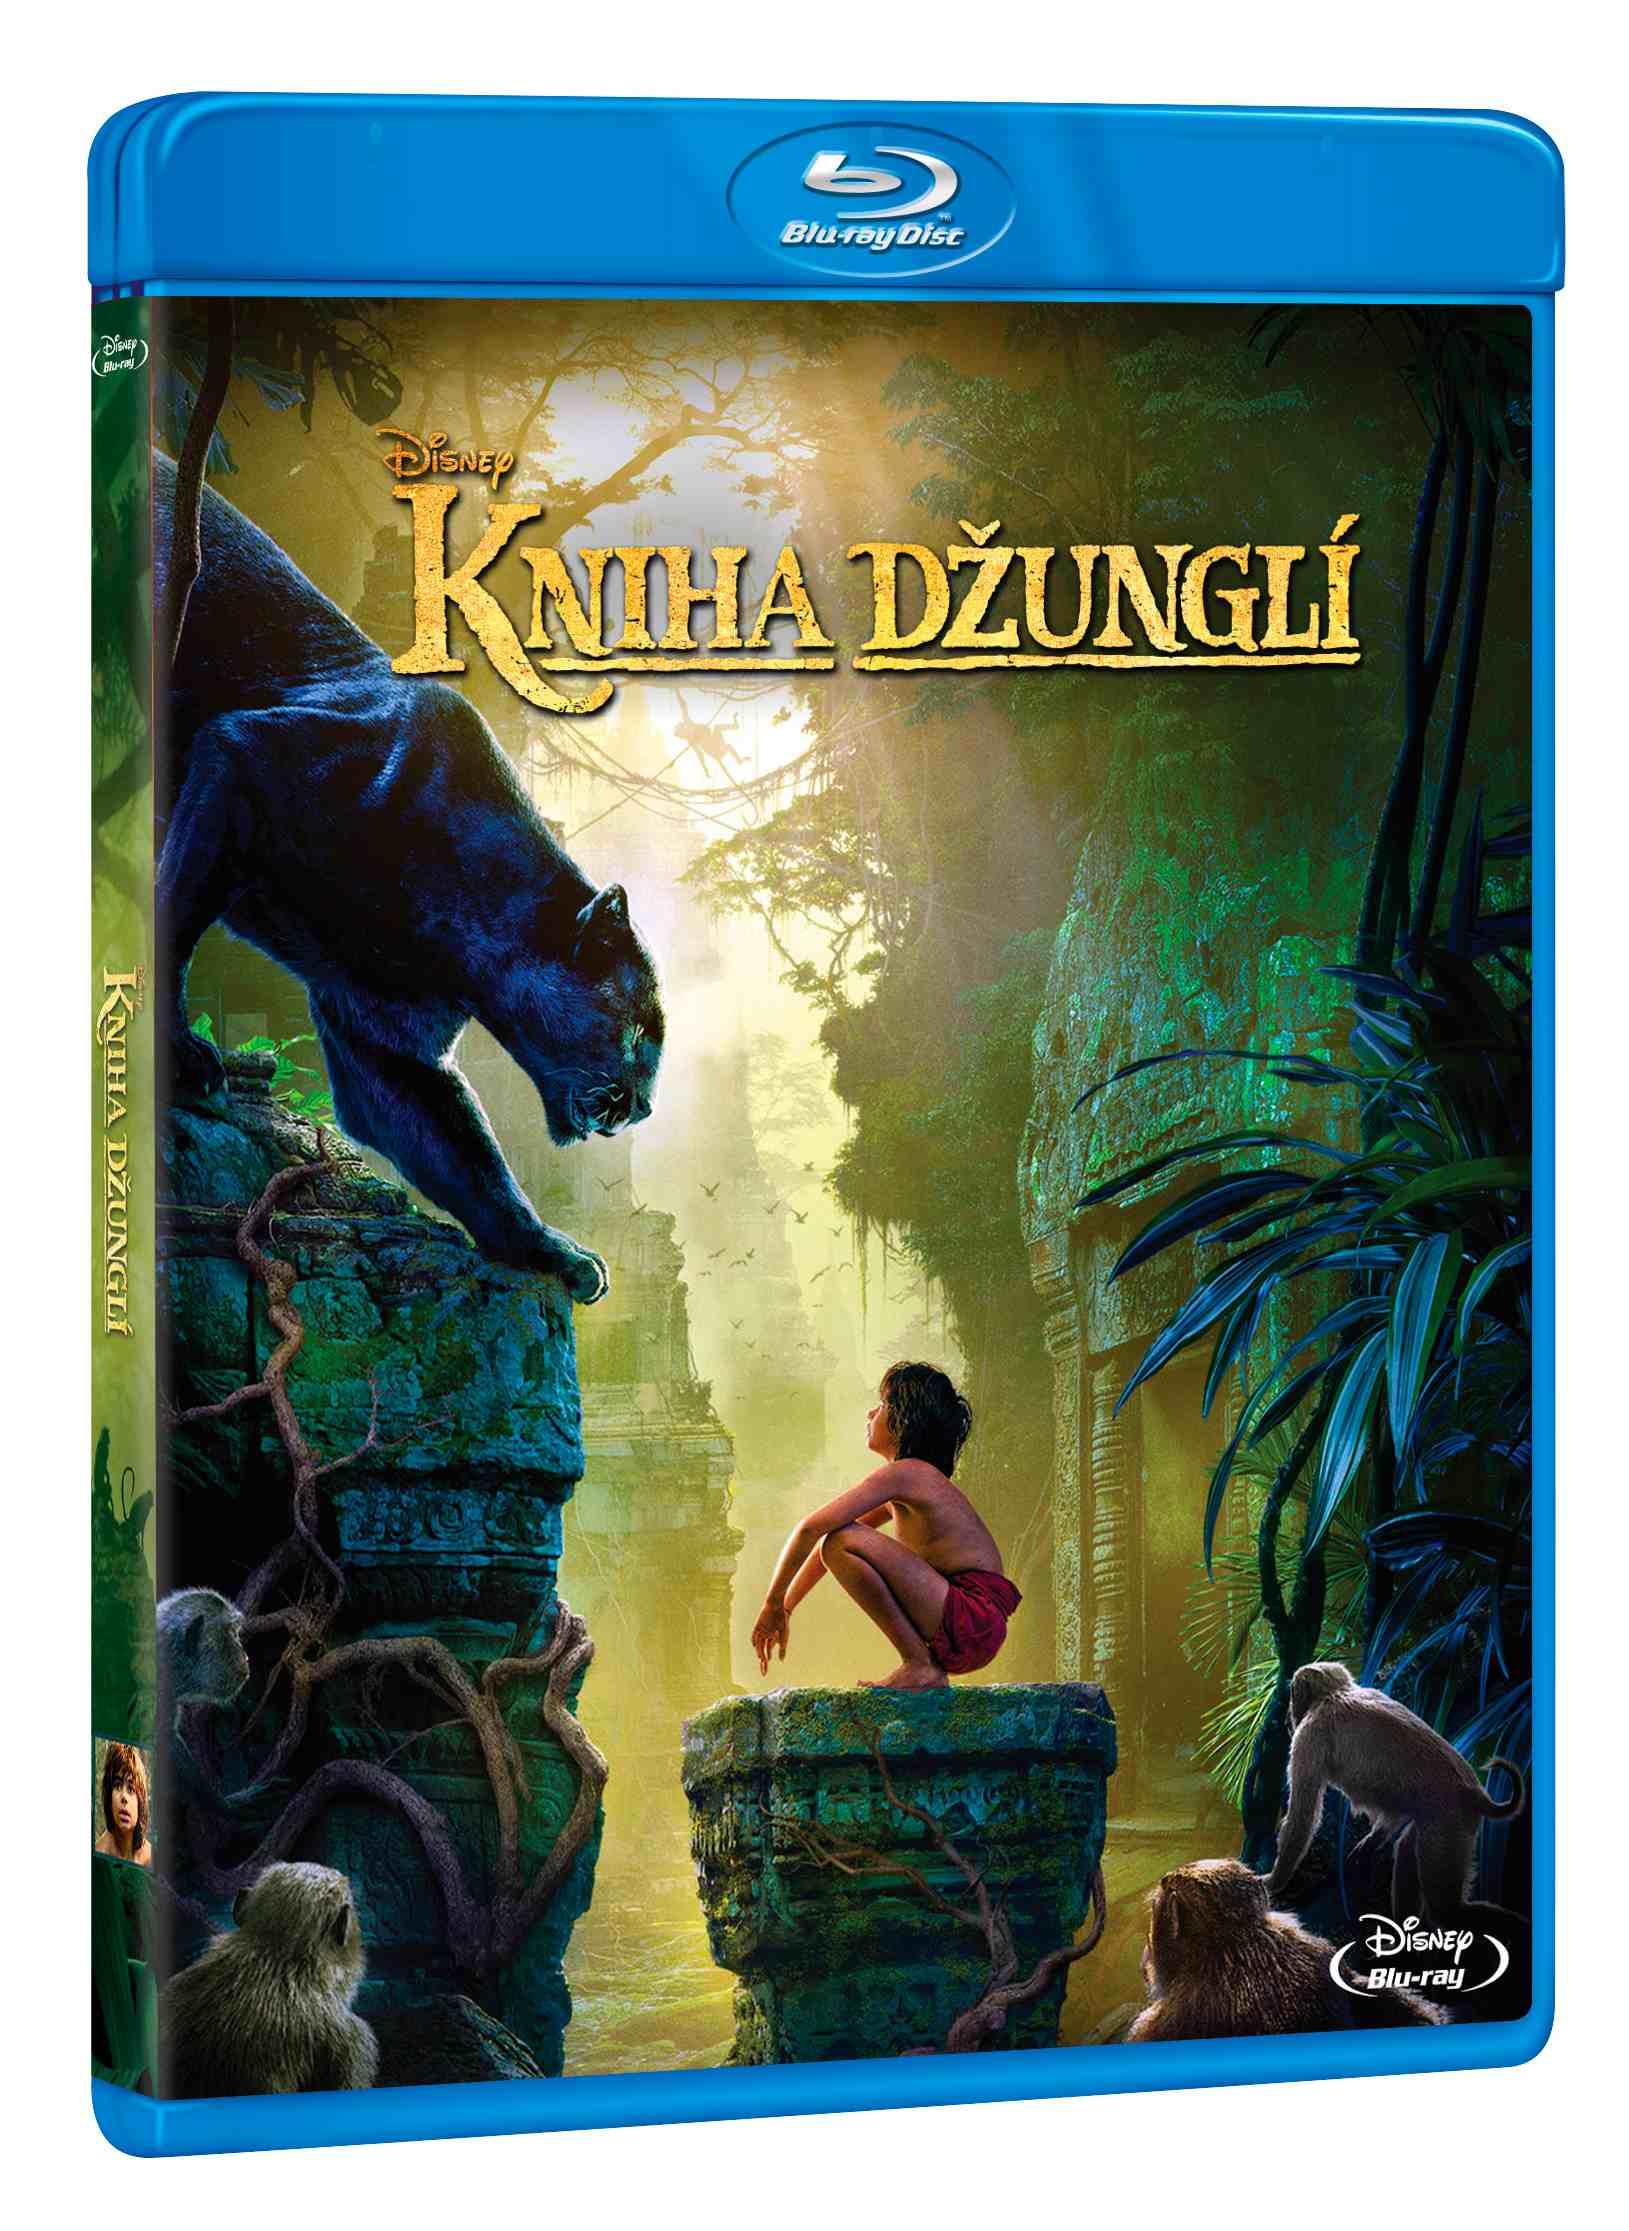 KNIHA DŽUNGLÍ (2016) - Blu-ray